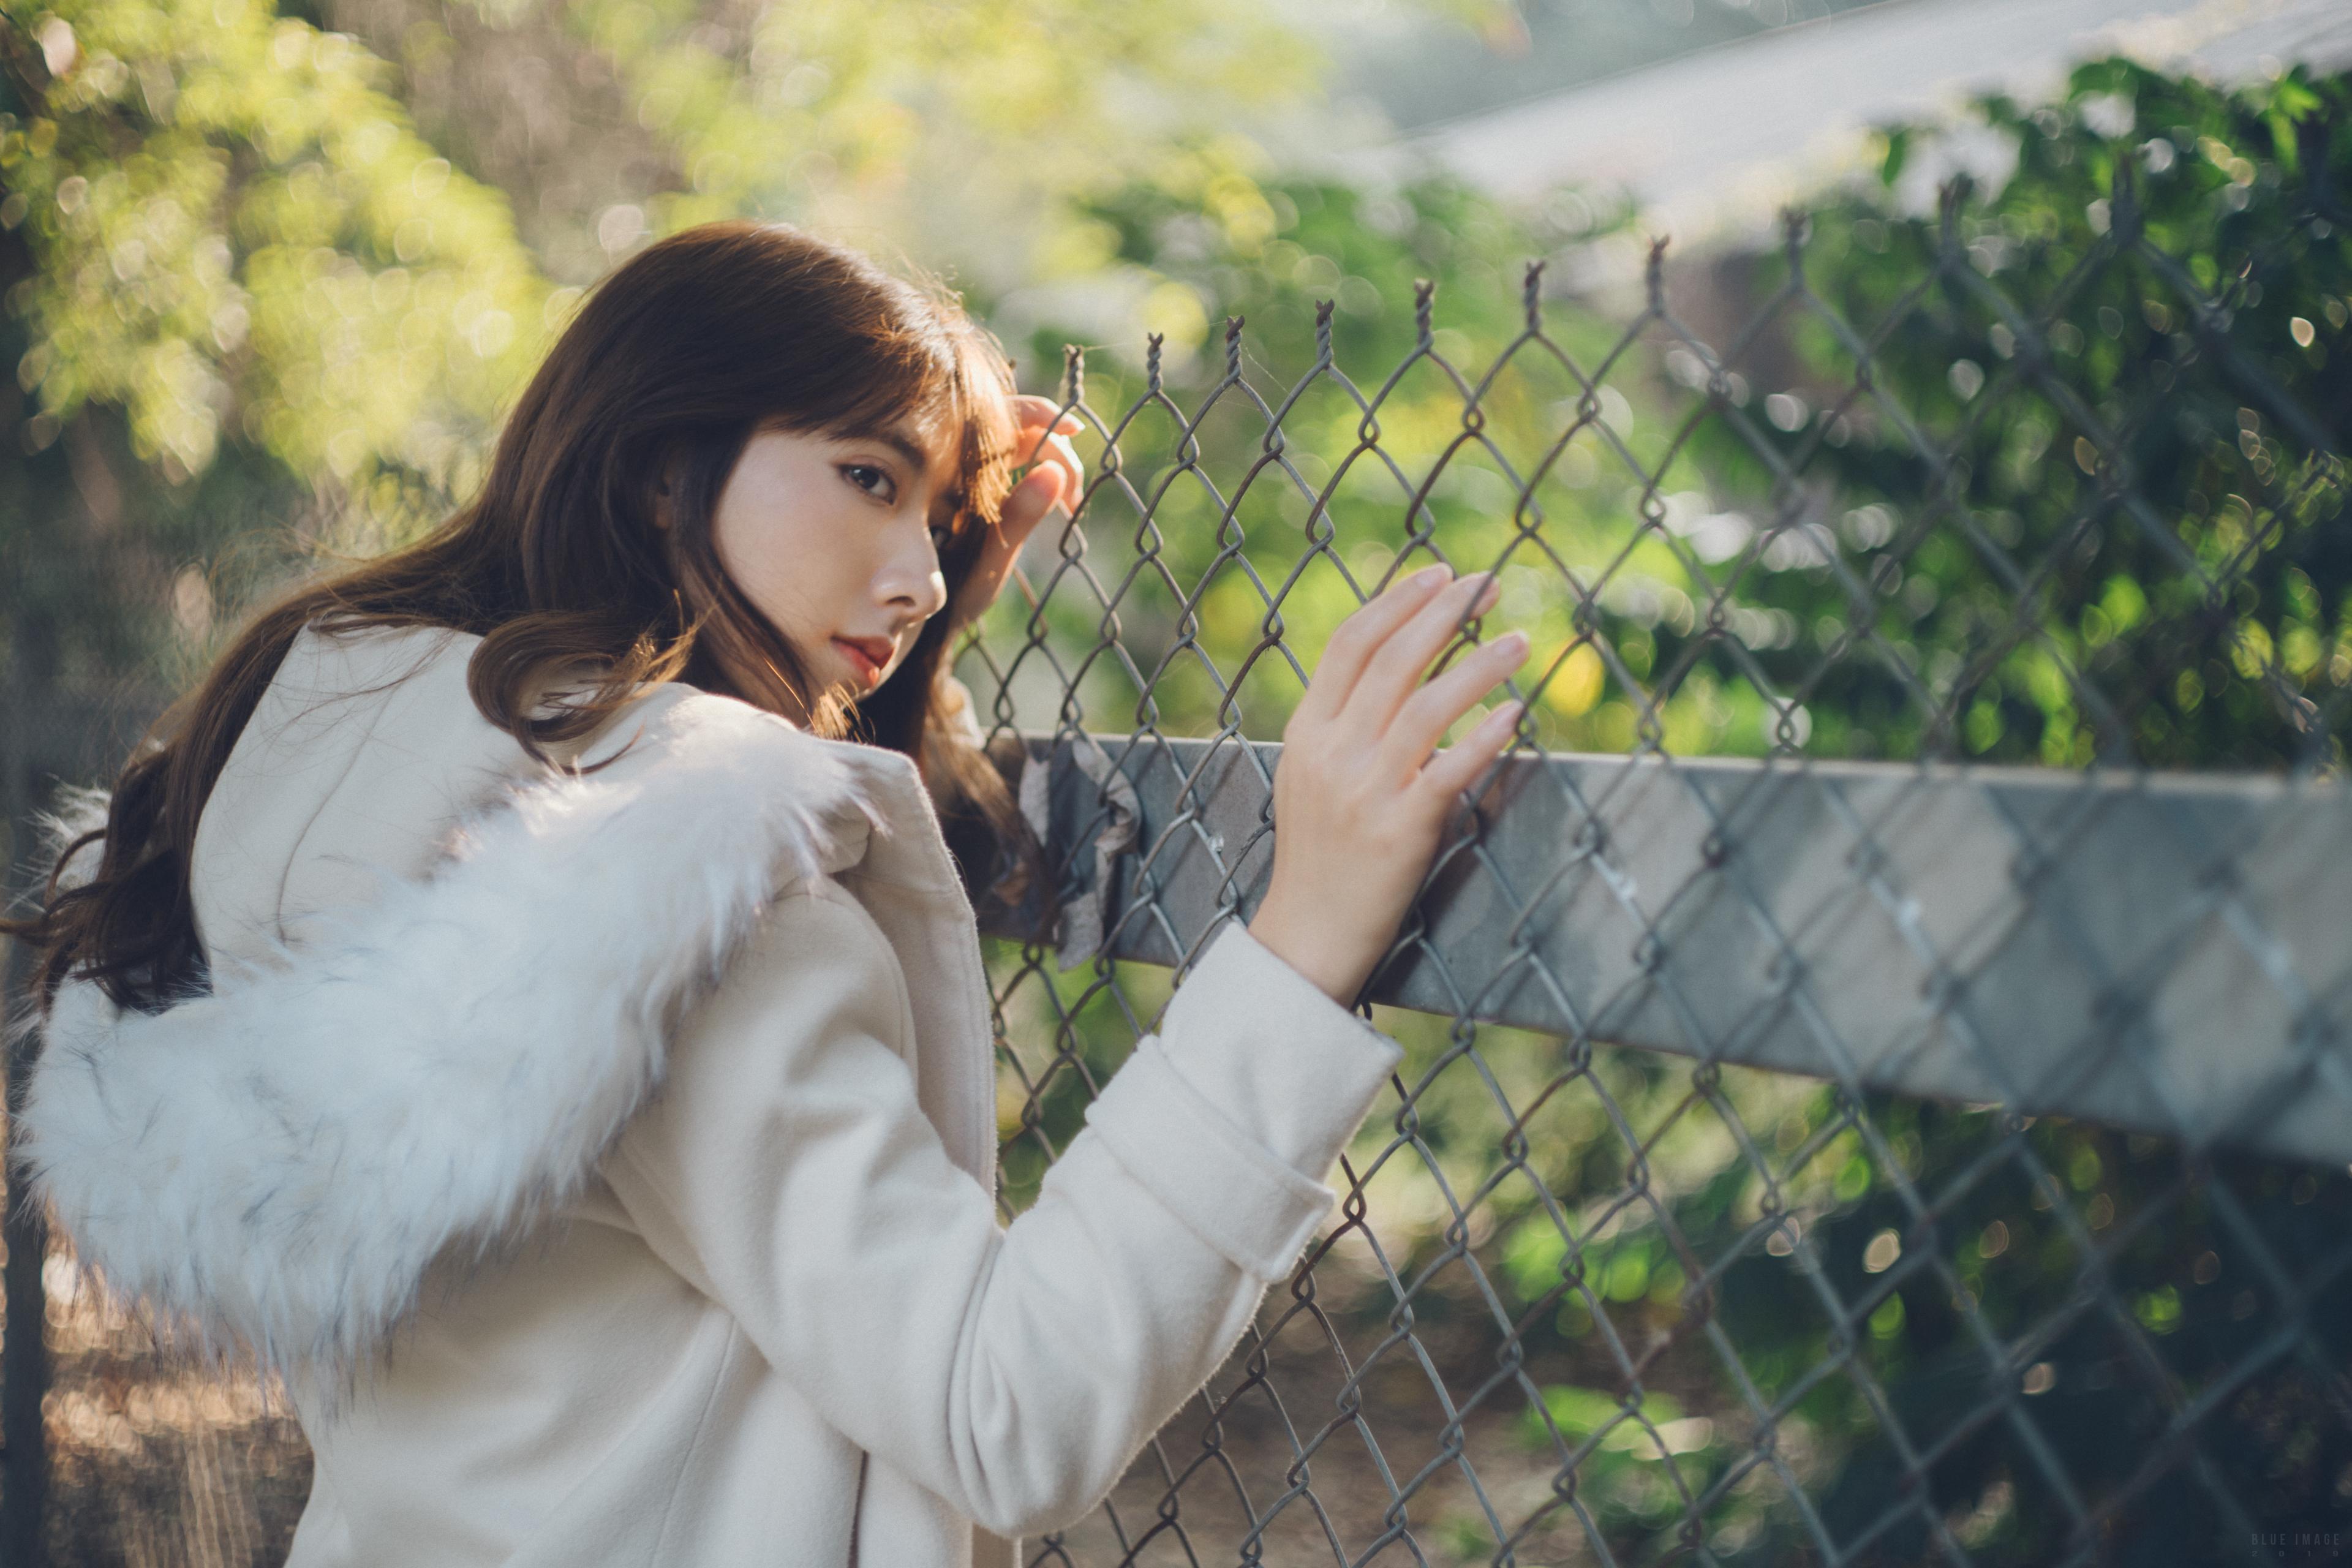 People 3840x2560 Asian women model brunette long hair fence white jacket